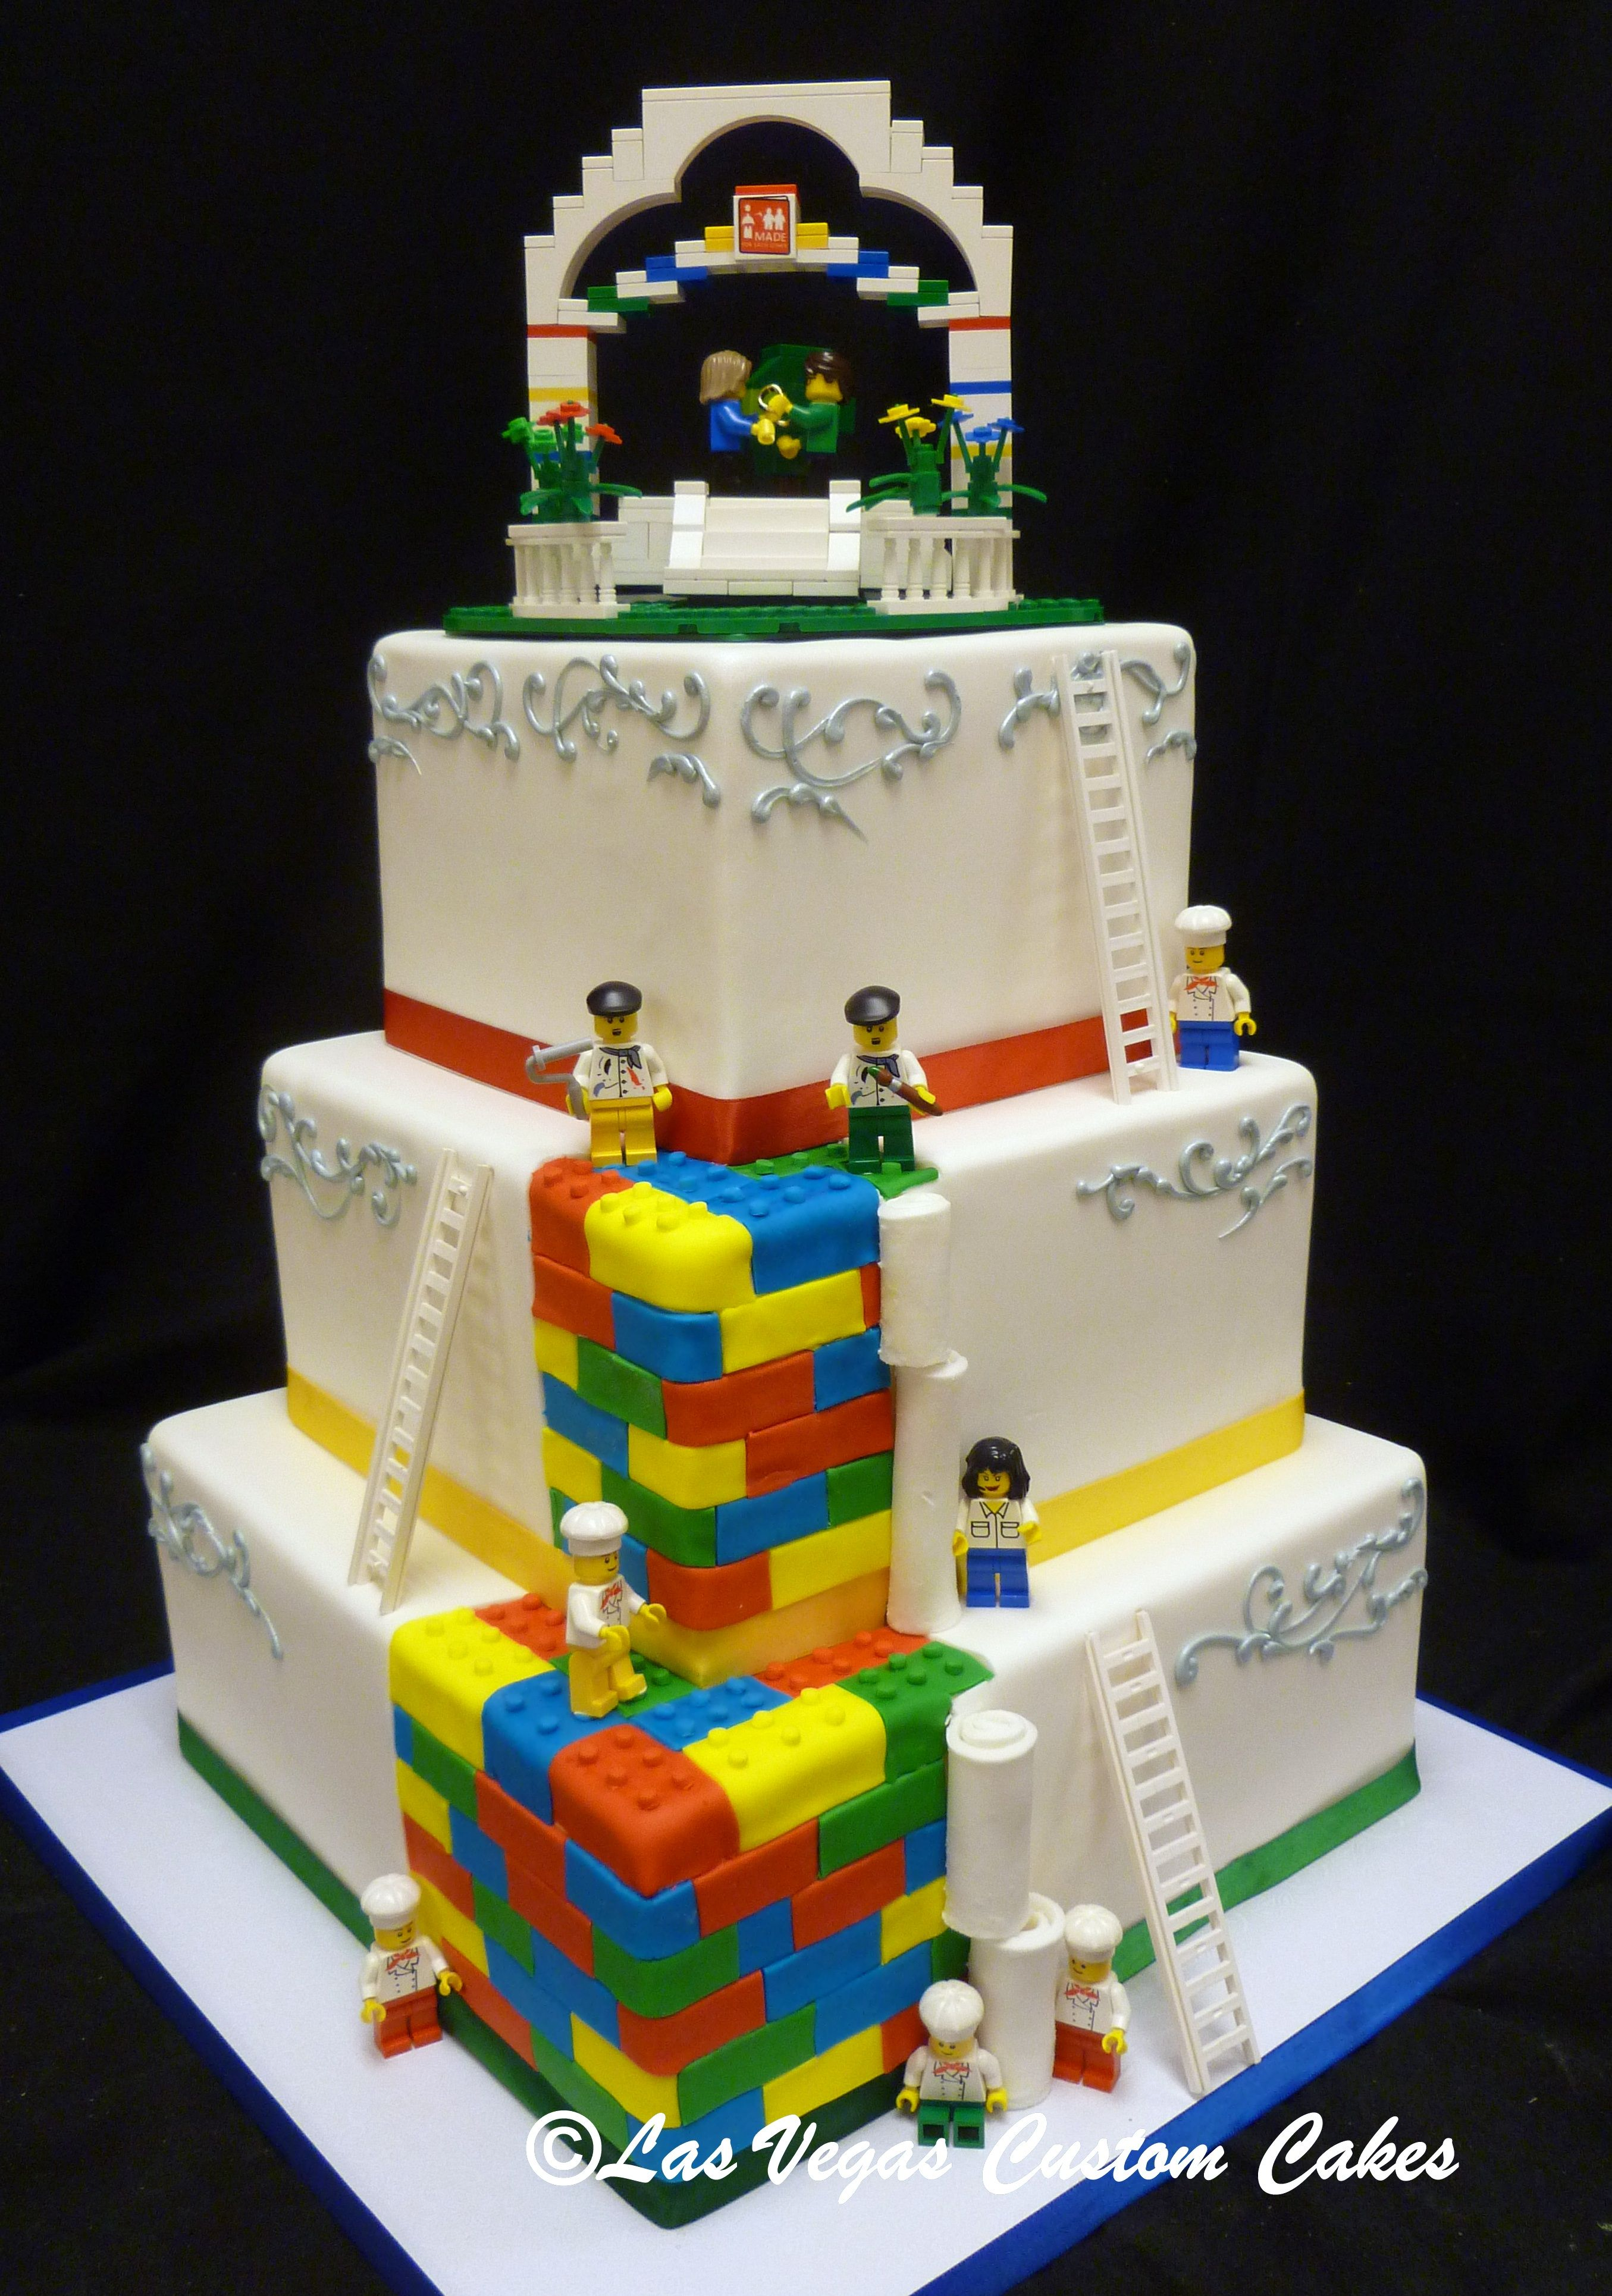 Lego Themed Wedding Cake by Las Vegas Custom Cakes Wedding Cakes